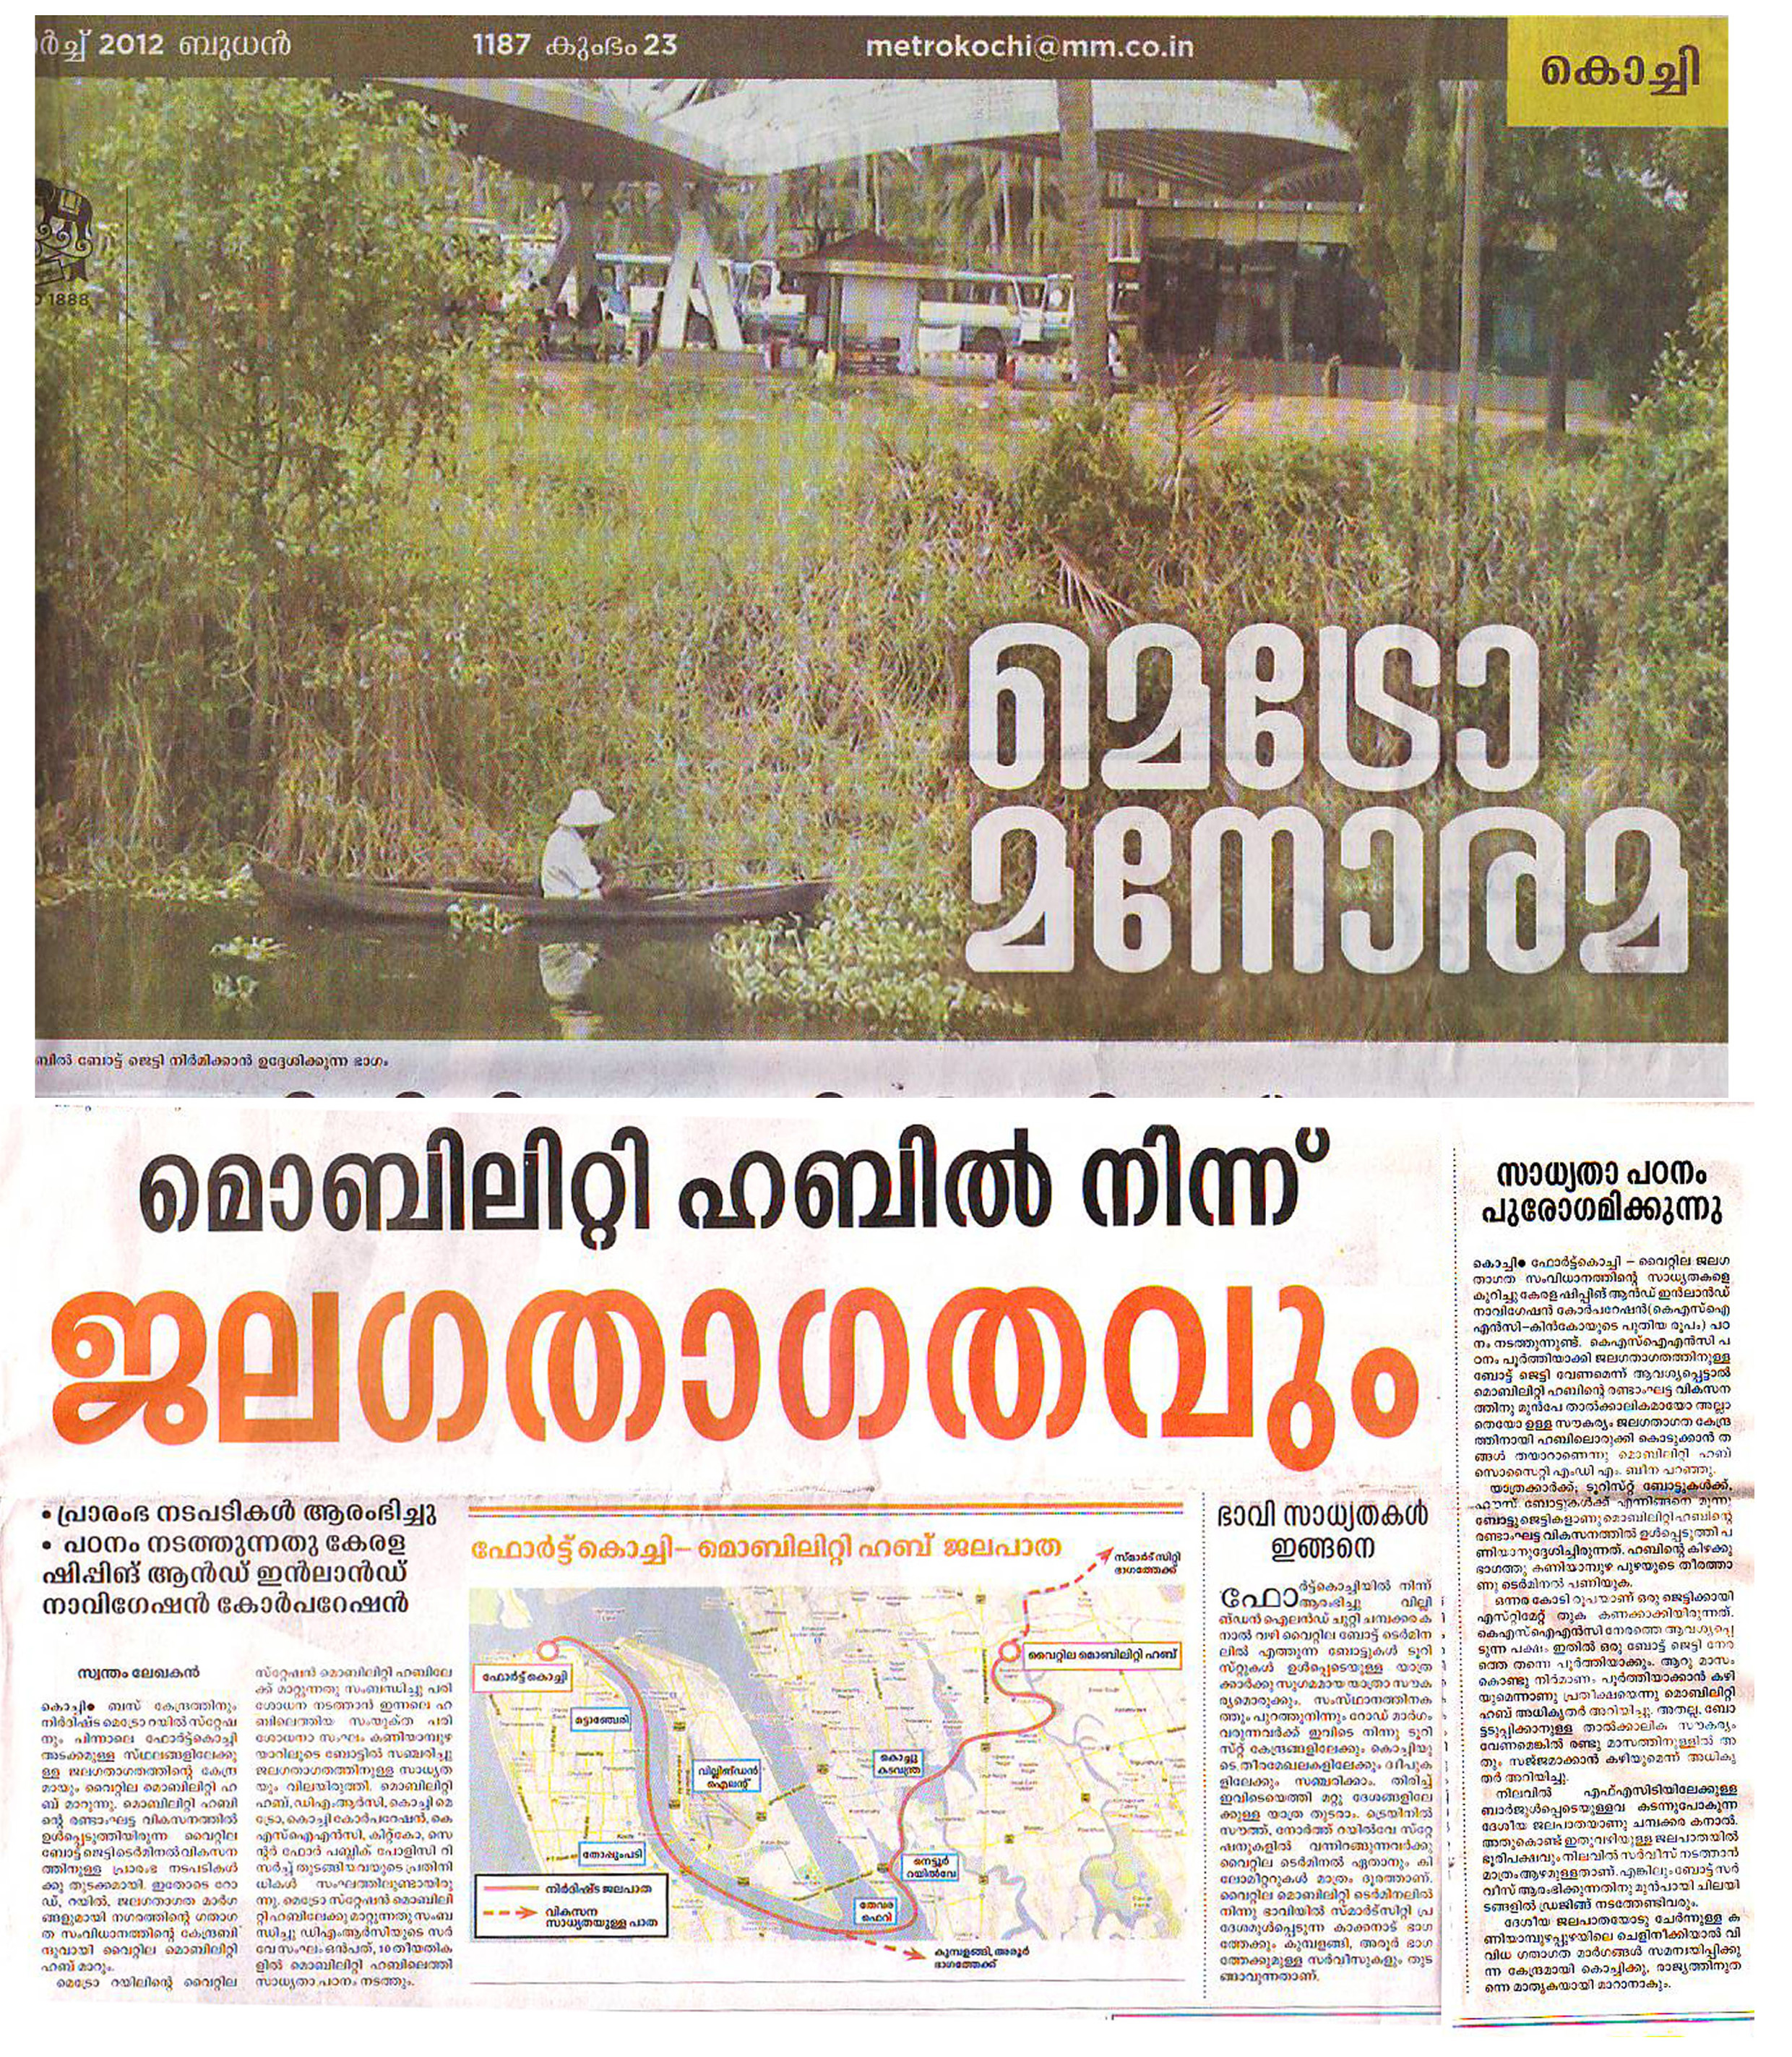 Malayala Manorama News | News in Malayala Manorama on 07-03